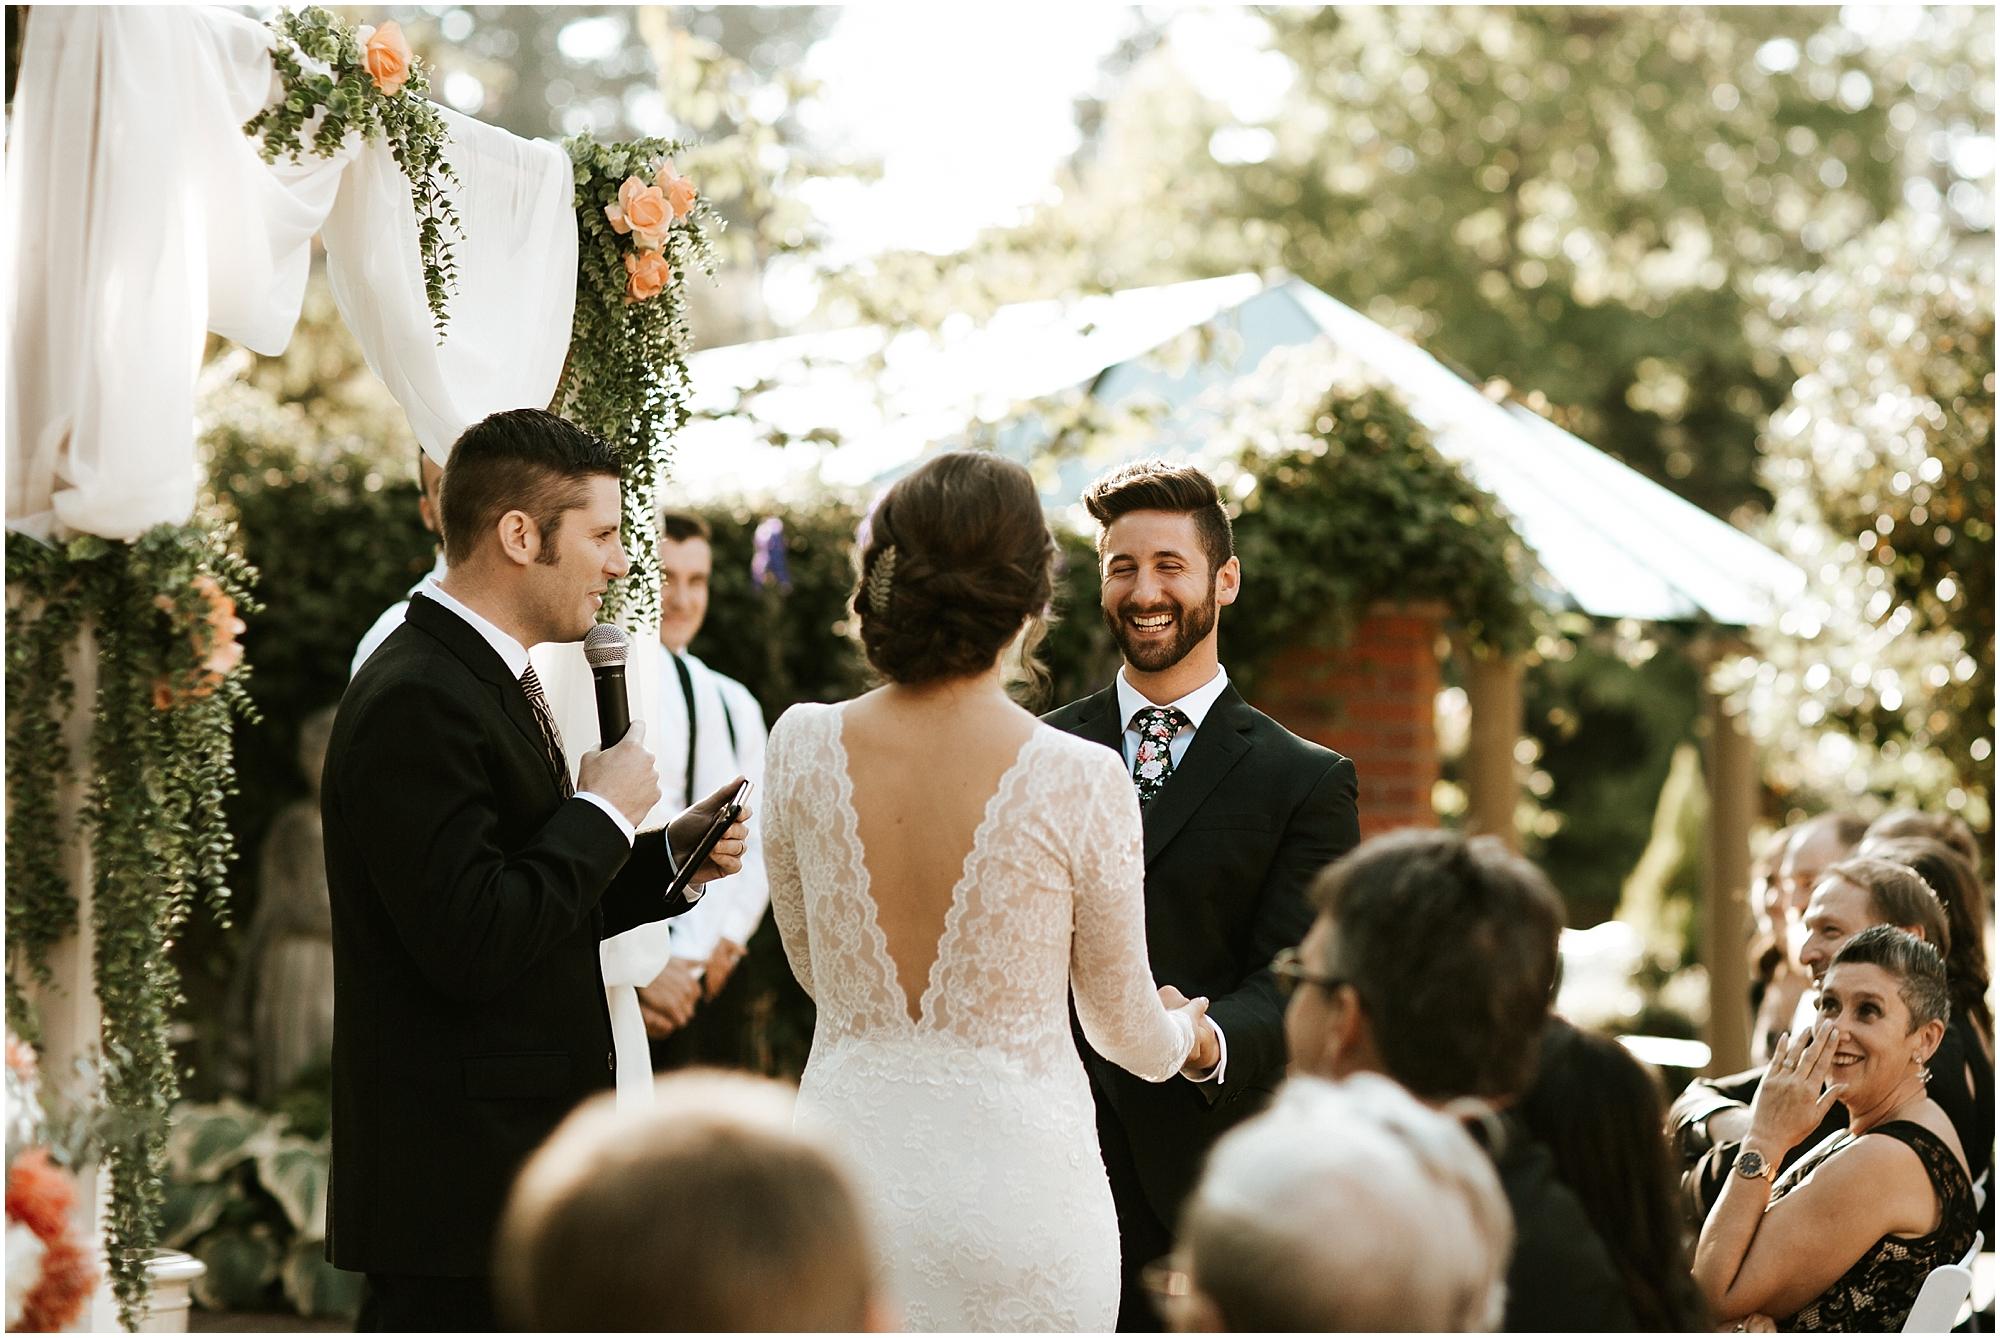 Lairmont Manor Wedding Bellingham Cassie Trottier Photo1052.jpg